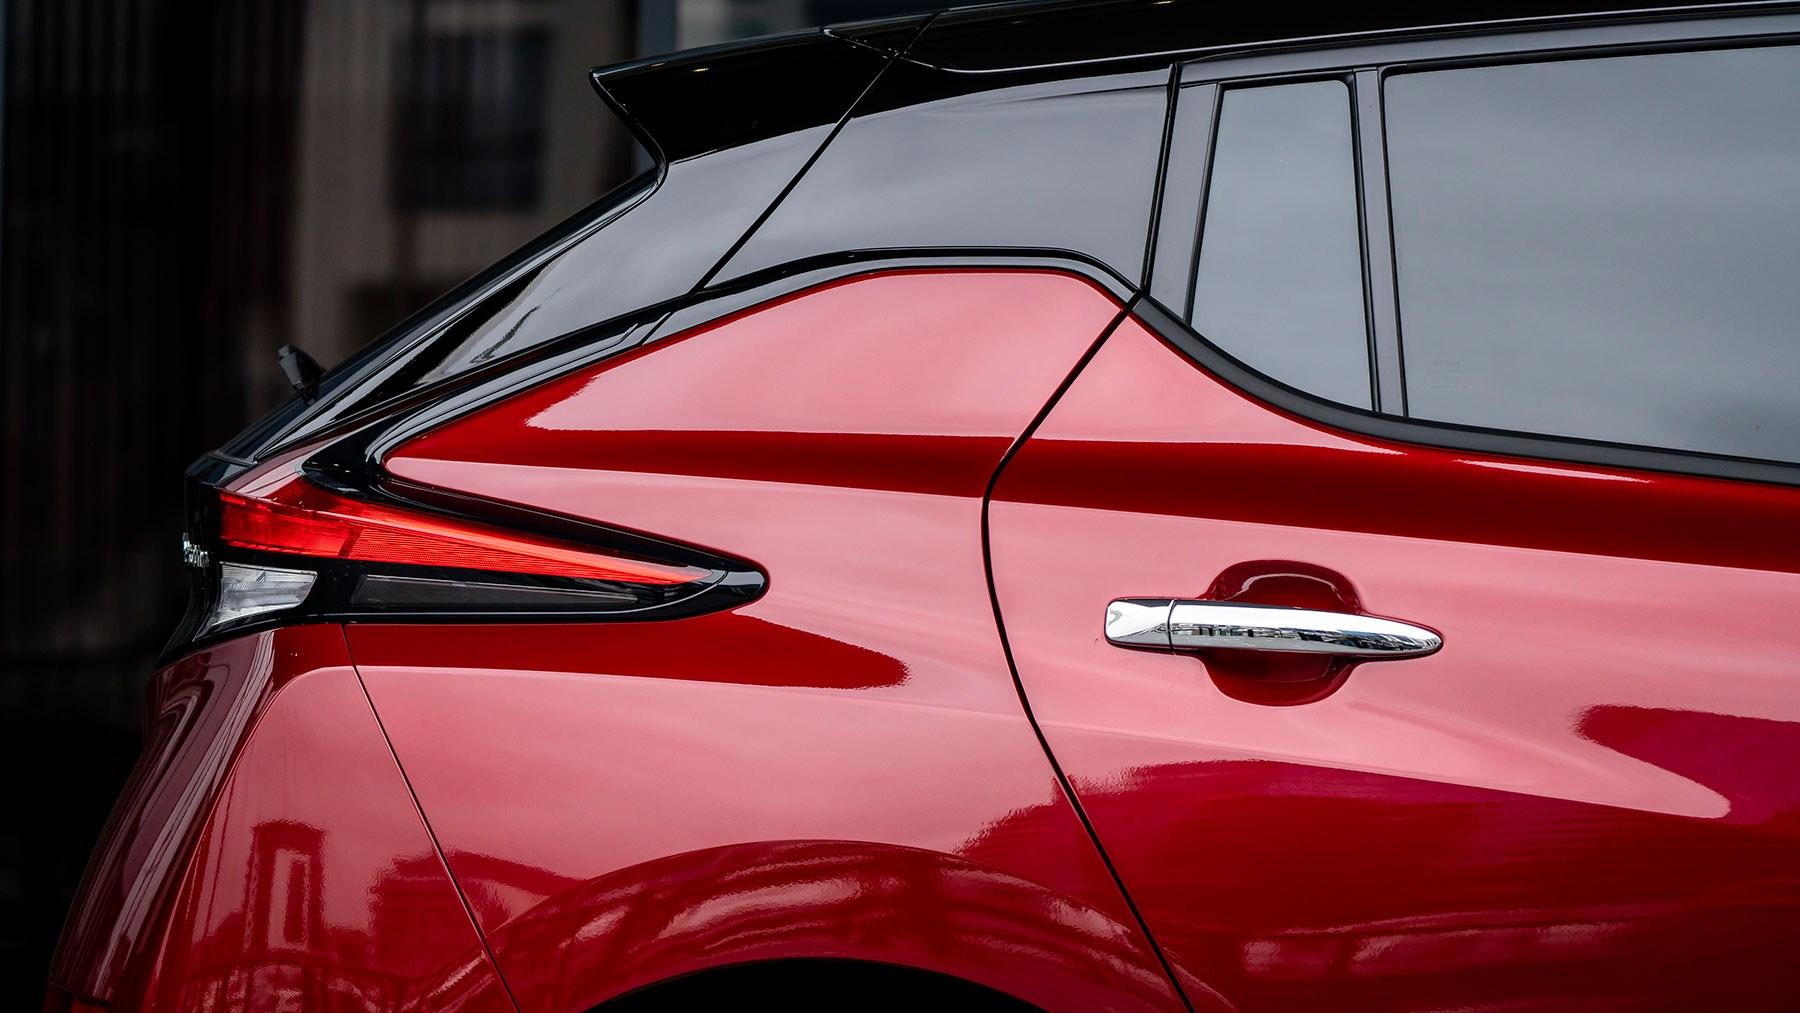 Nissan Leaf rear window